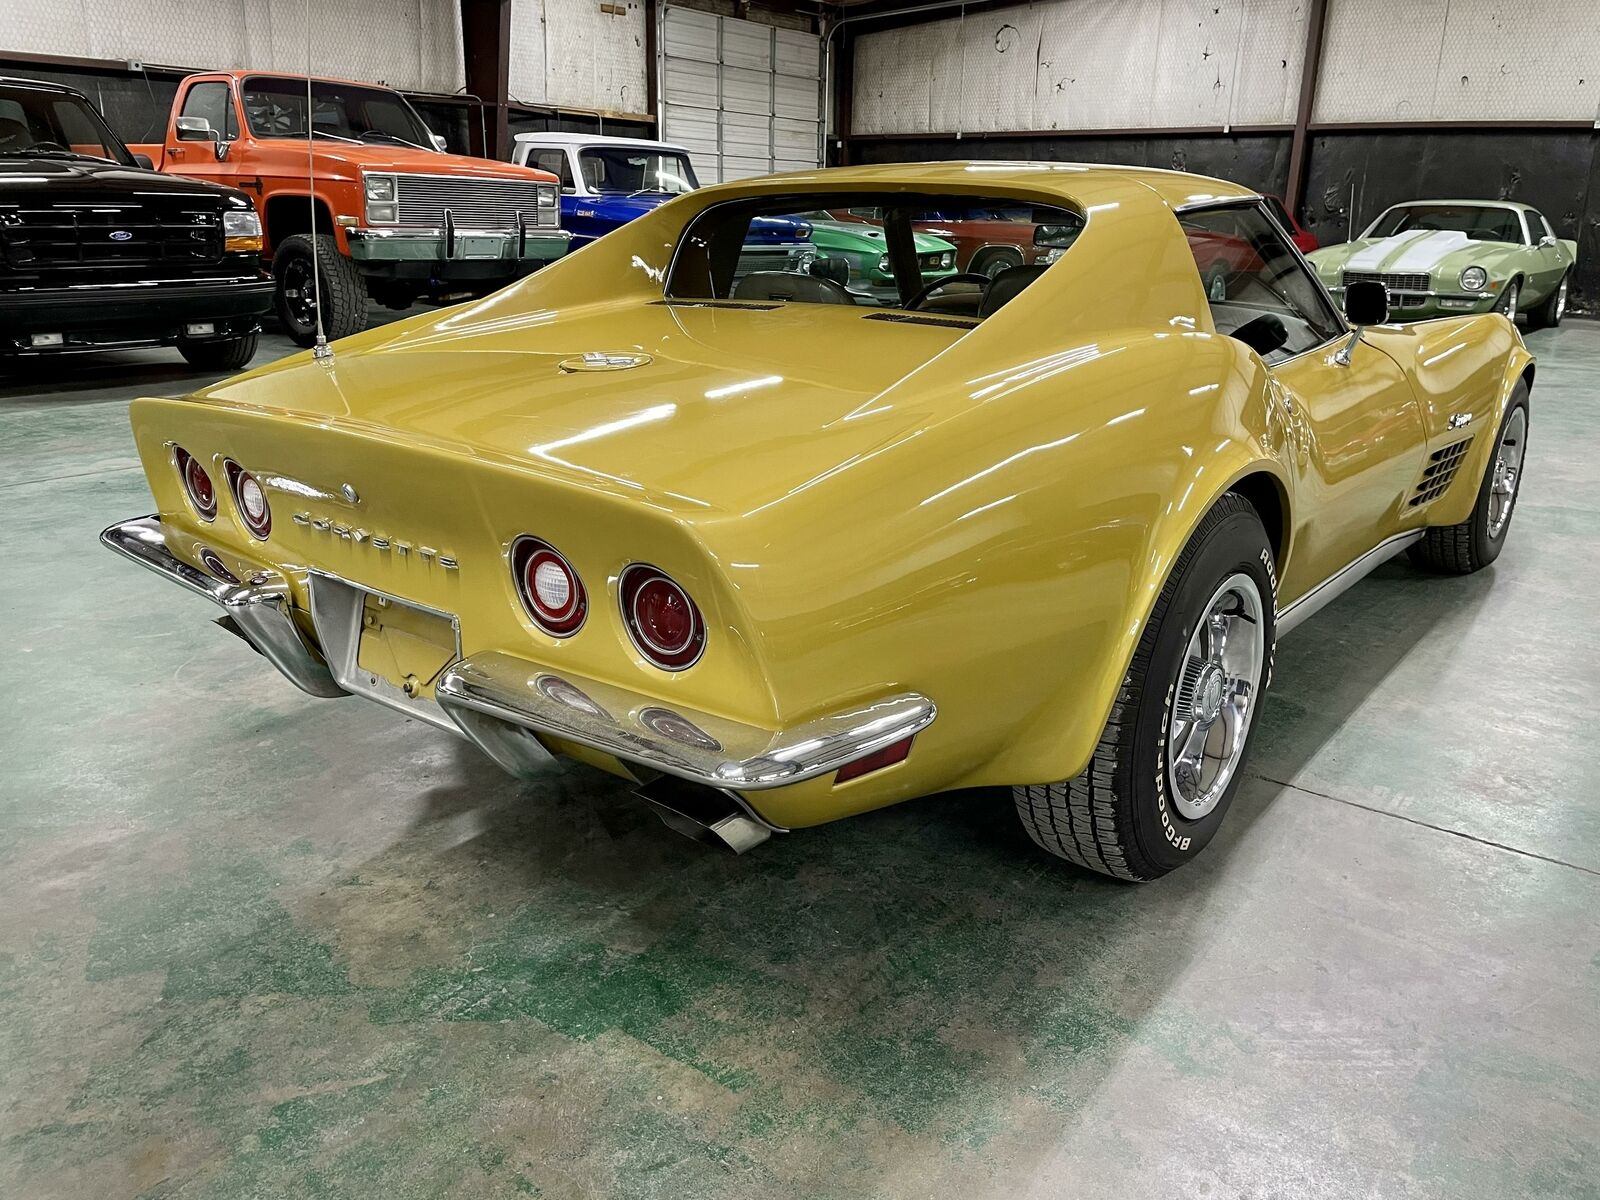 1972 Yellow Chevrolet Corvette   | C3 Corvette Photo 5